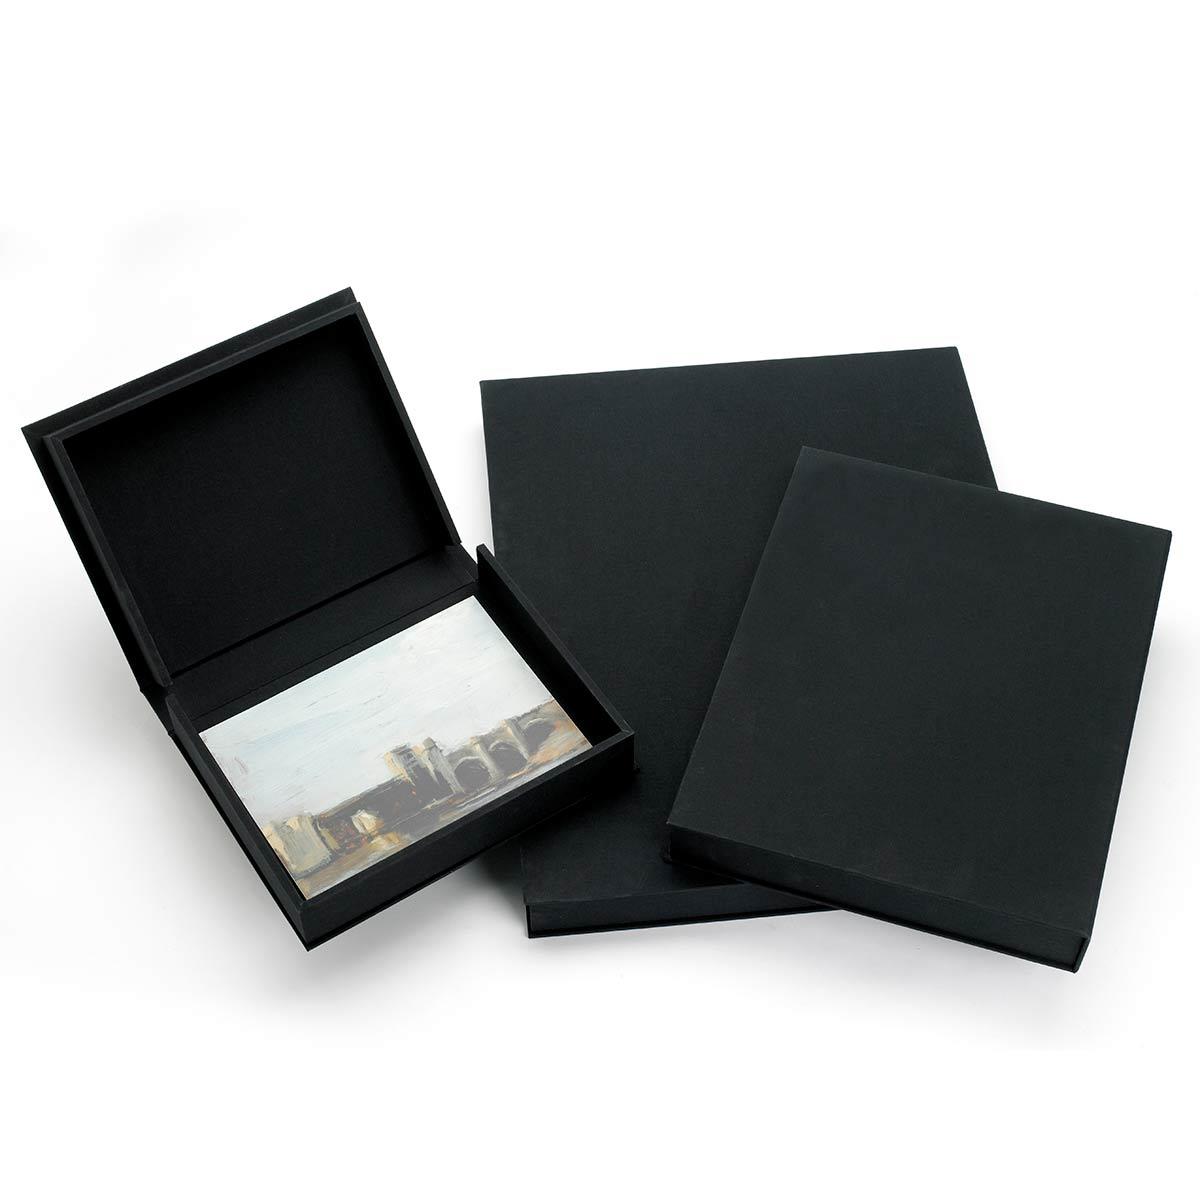 Fabulous Lipped Clamshell Luxury Presentation Portfolio Box | TALAS LS46